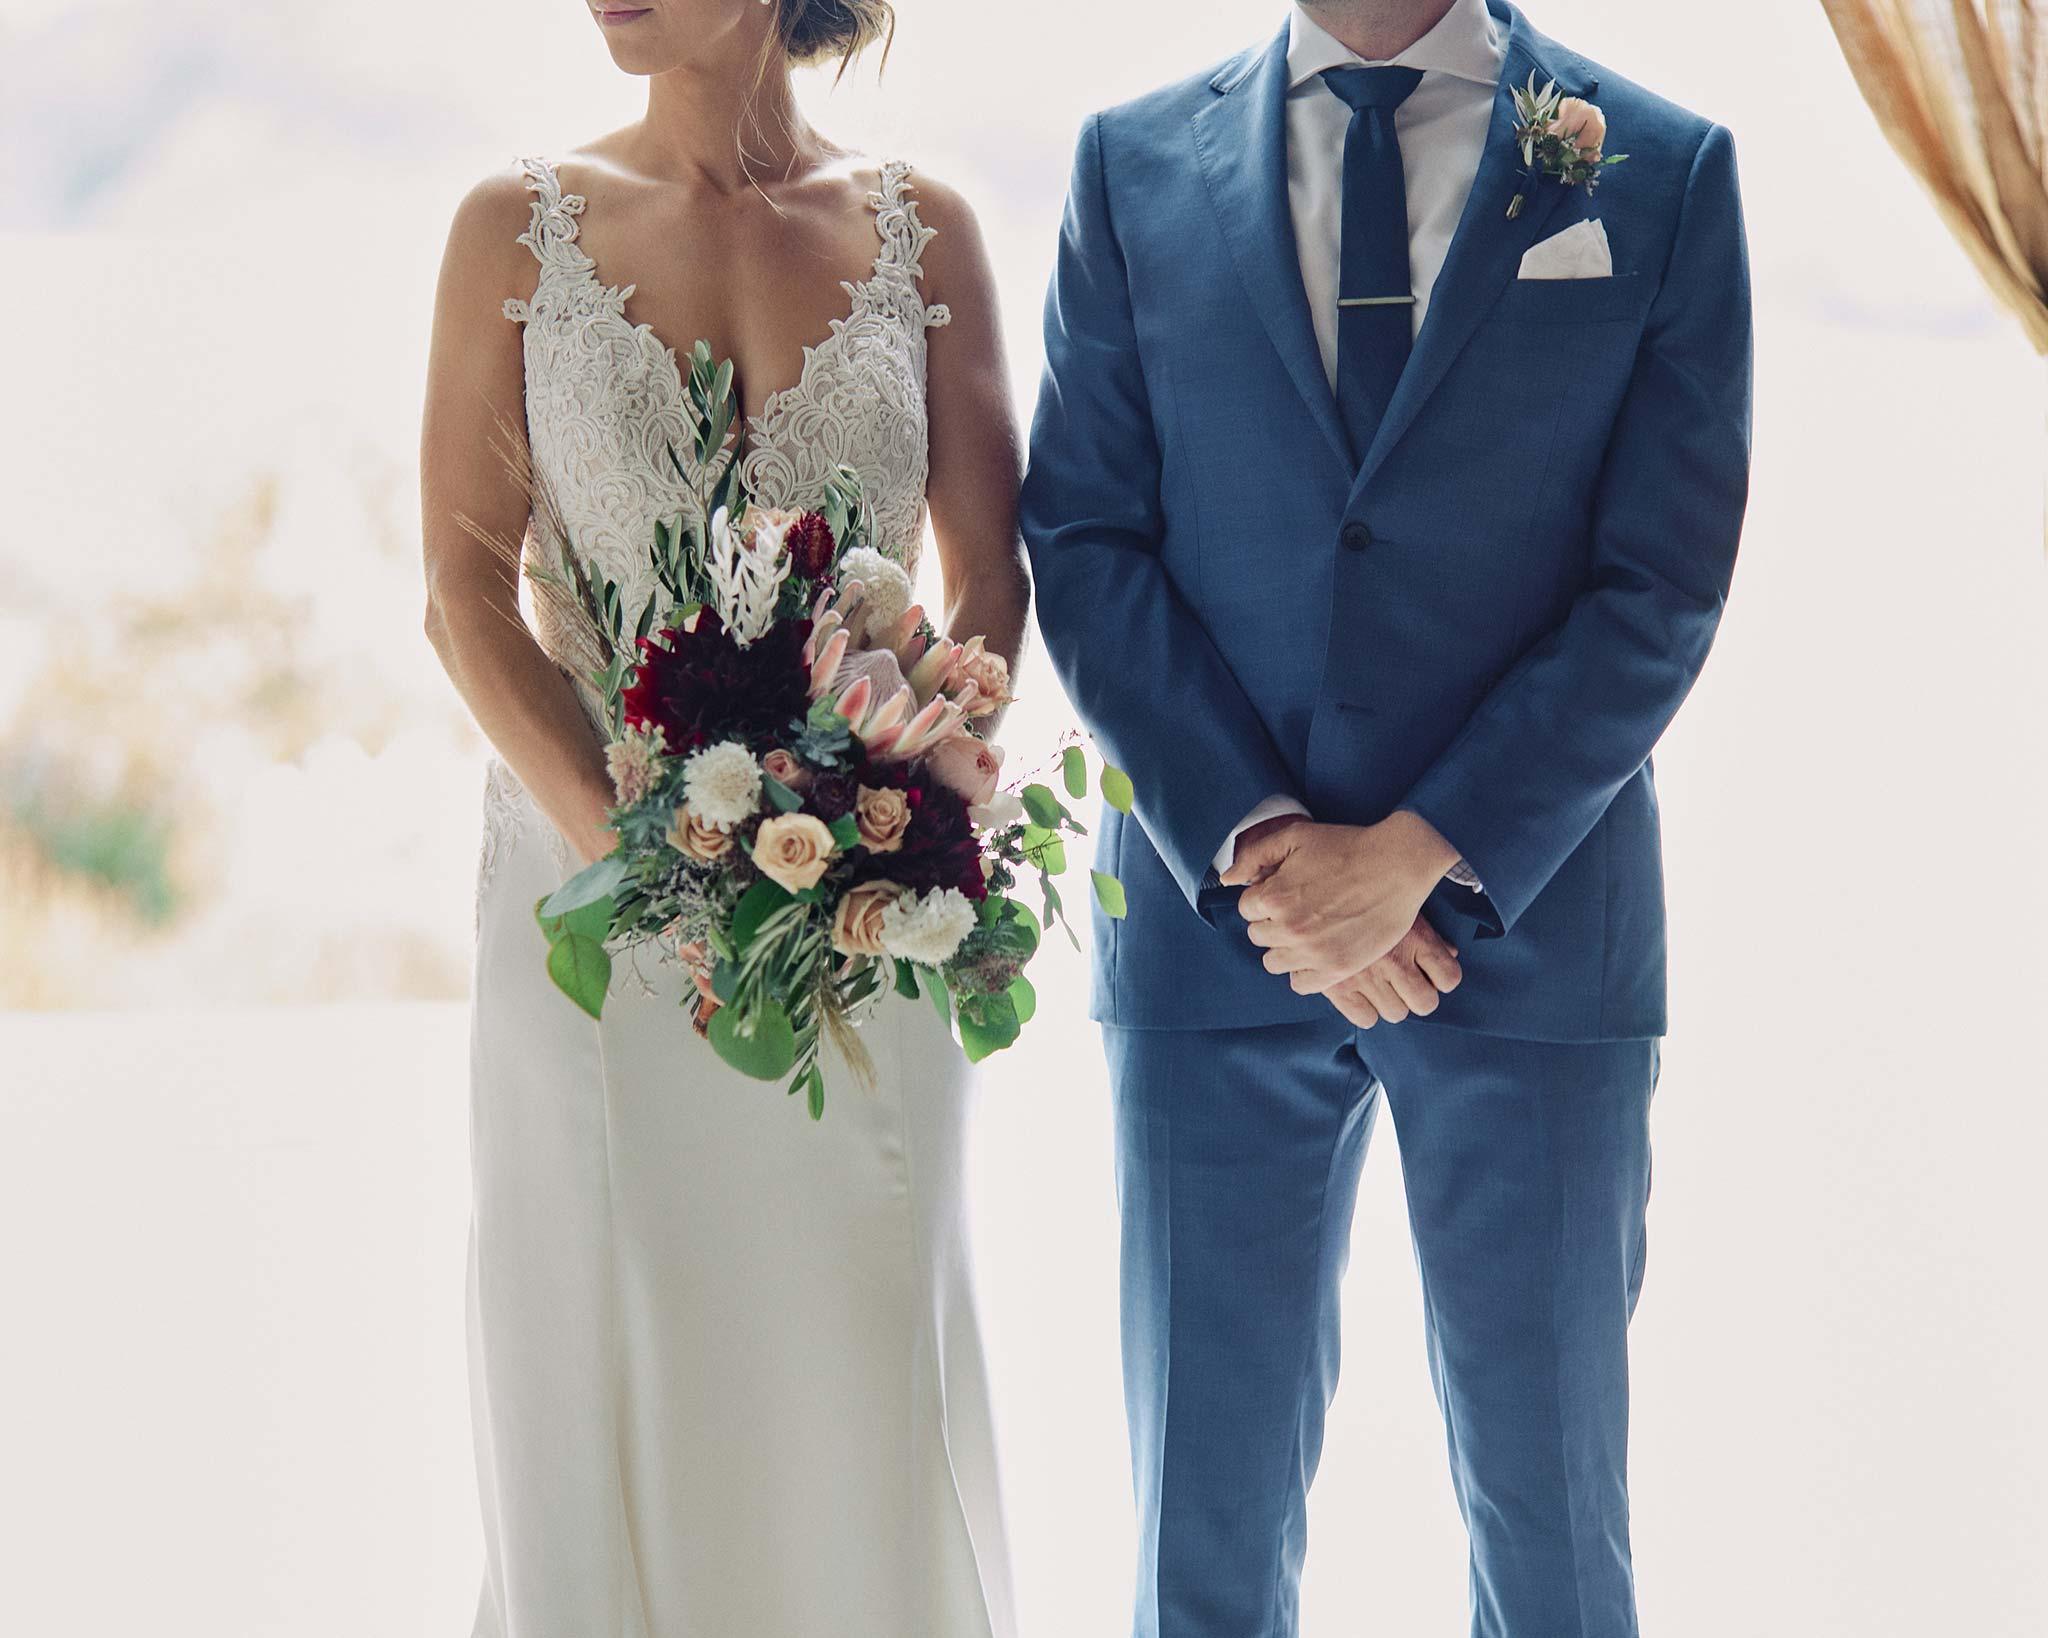 Zonzo estate wedding couple bouquet